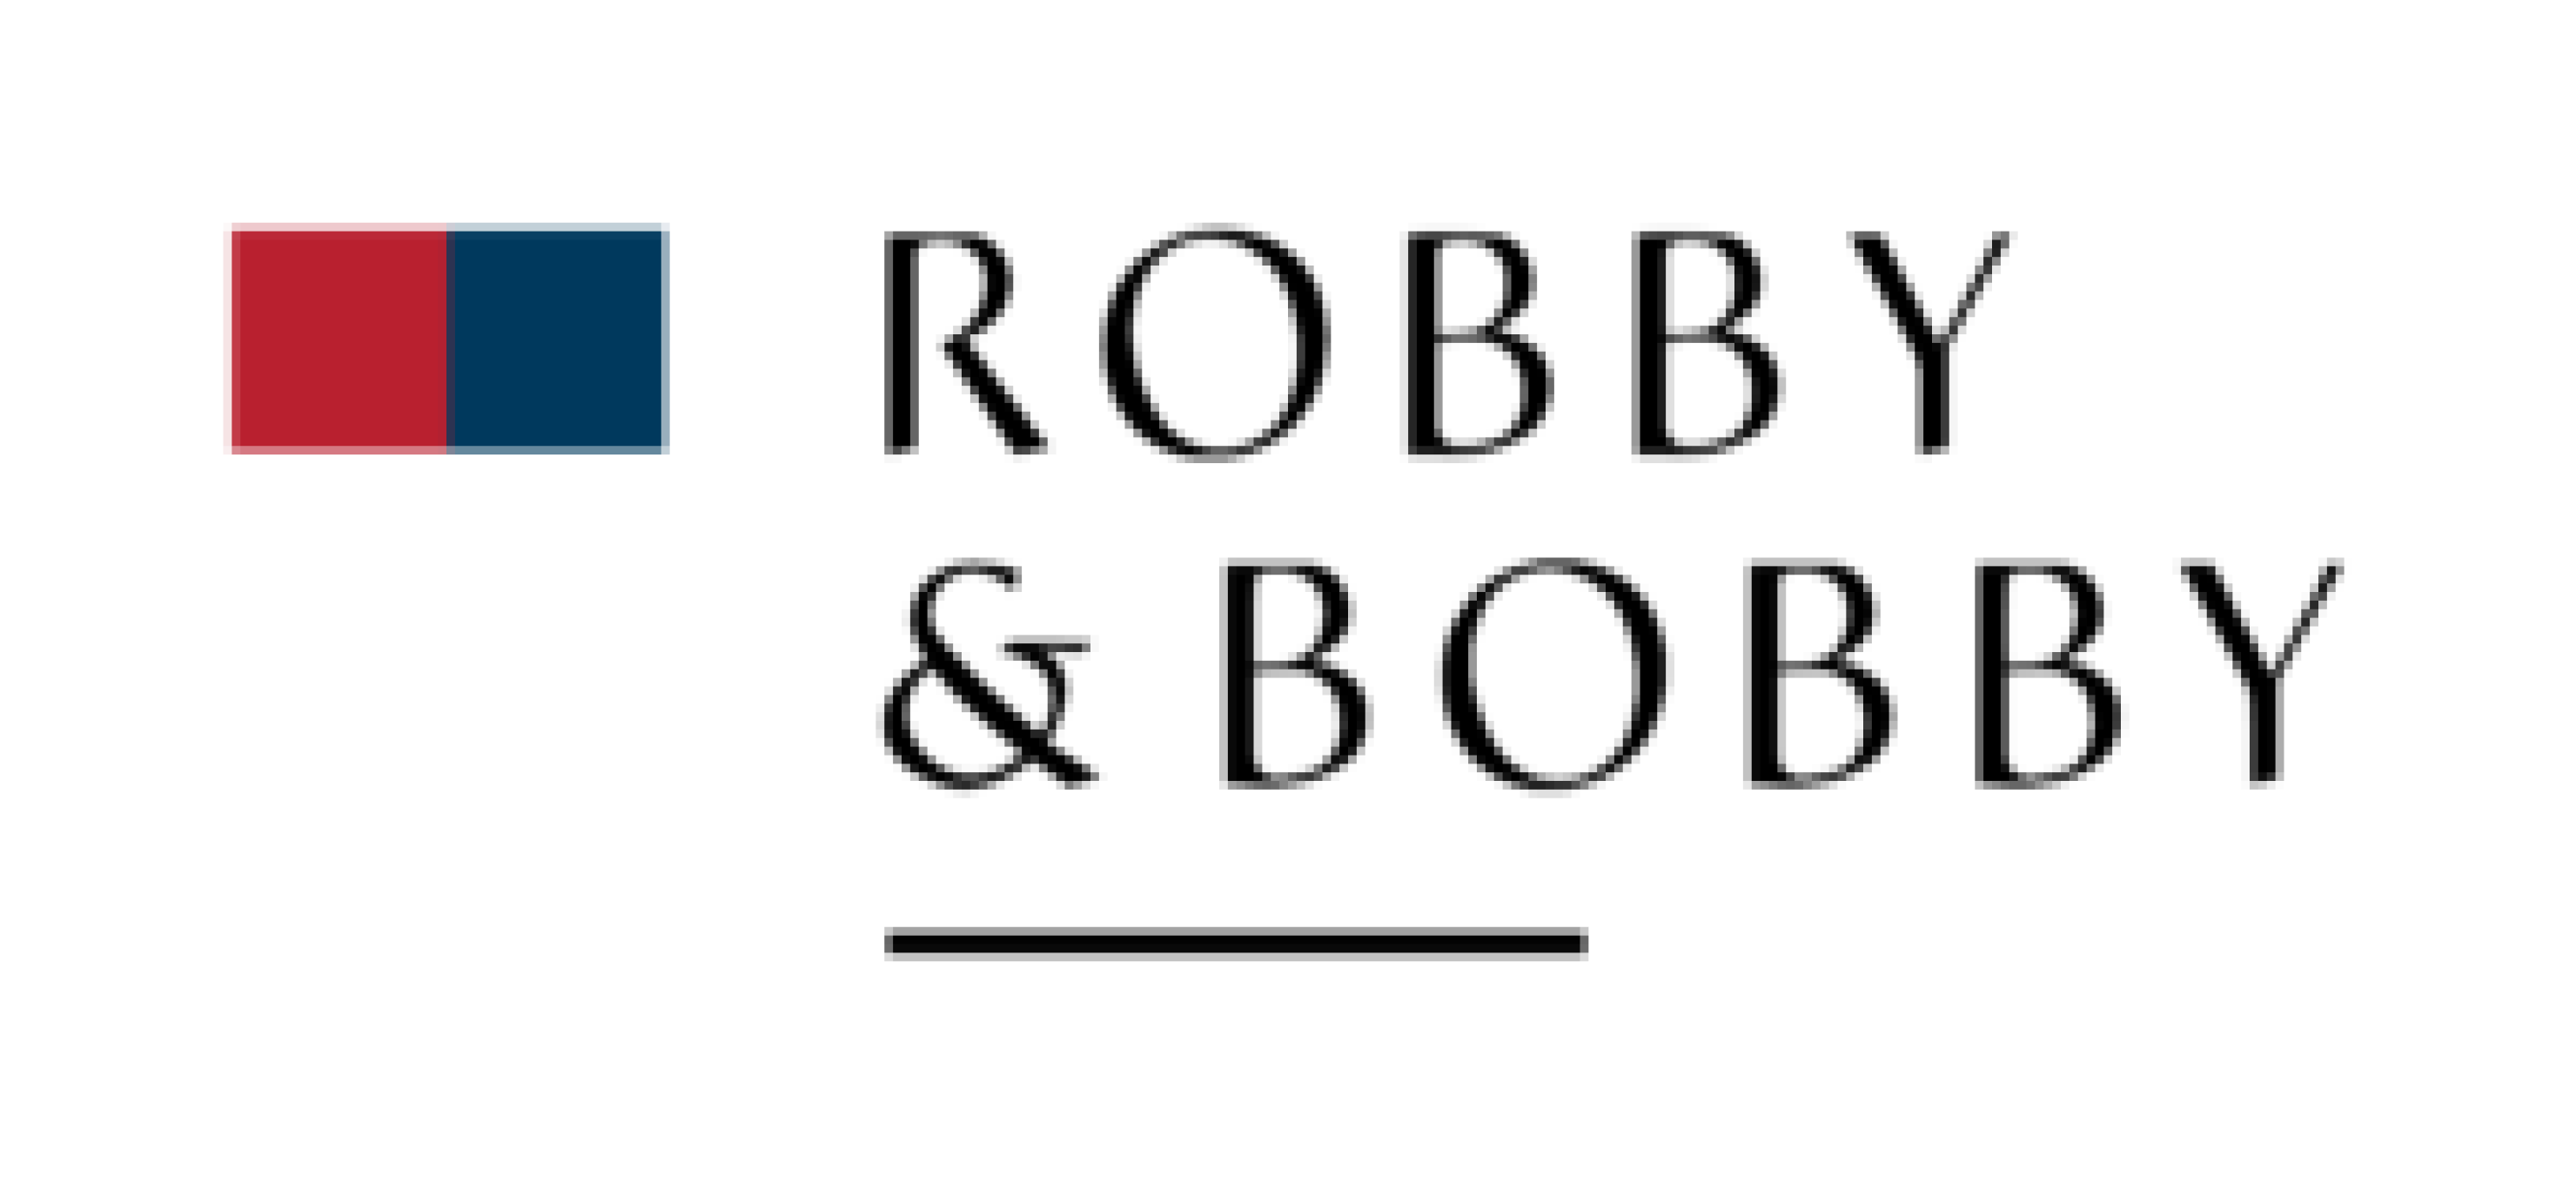 Robby & Bobby logo